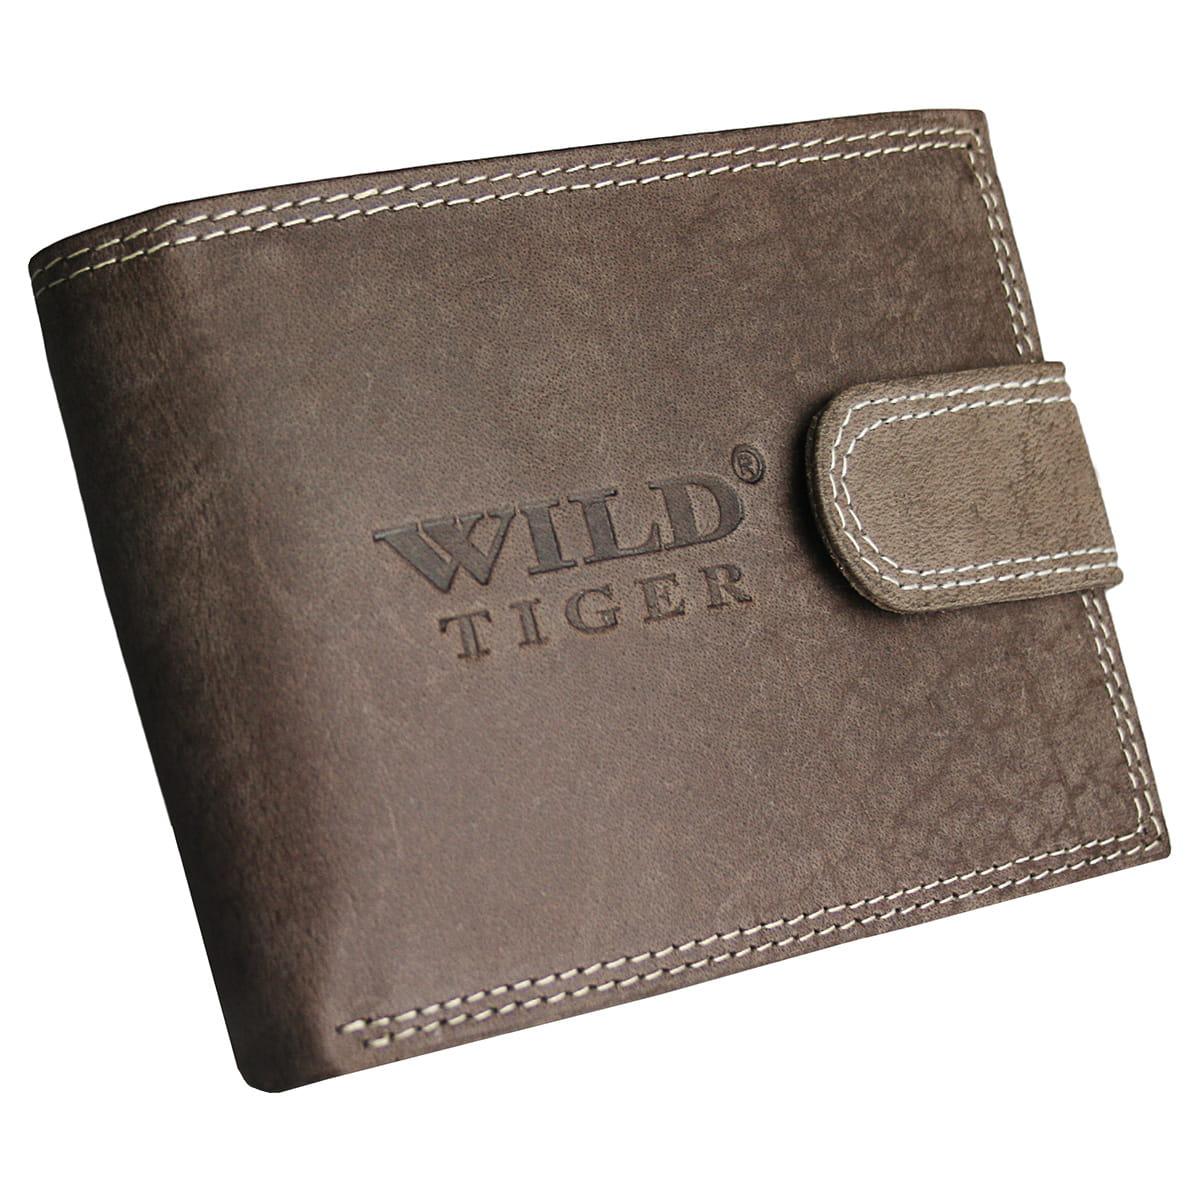 1d9a712f46606 Portfel męski skóra nubuk nap Wild Tiger